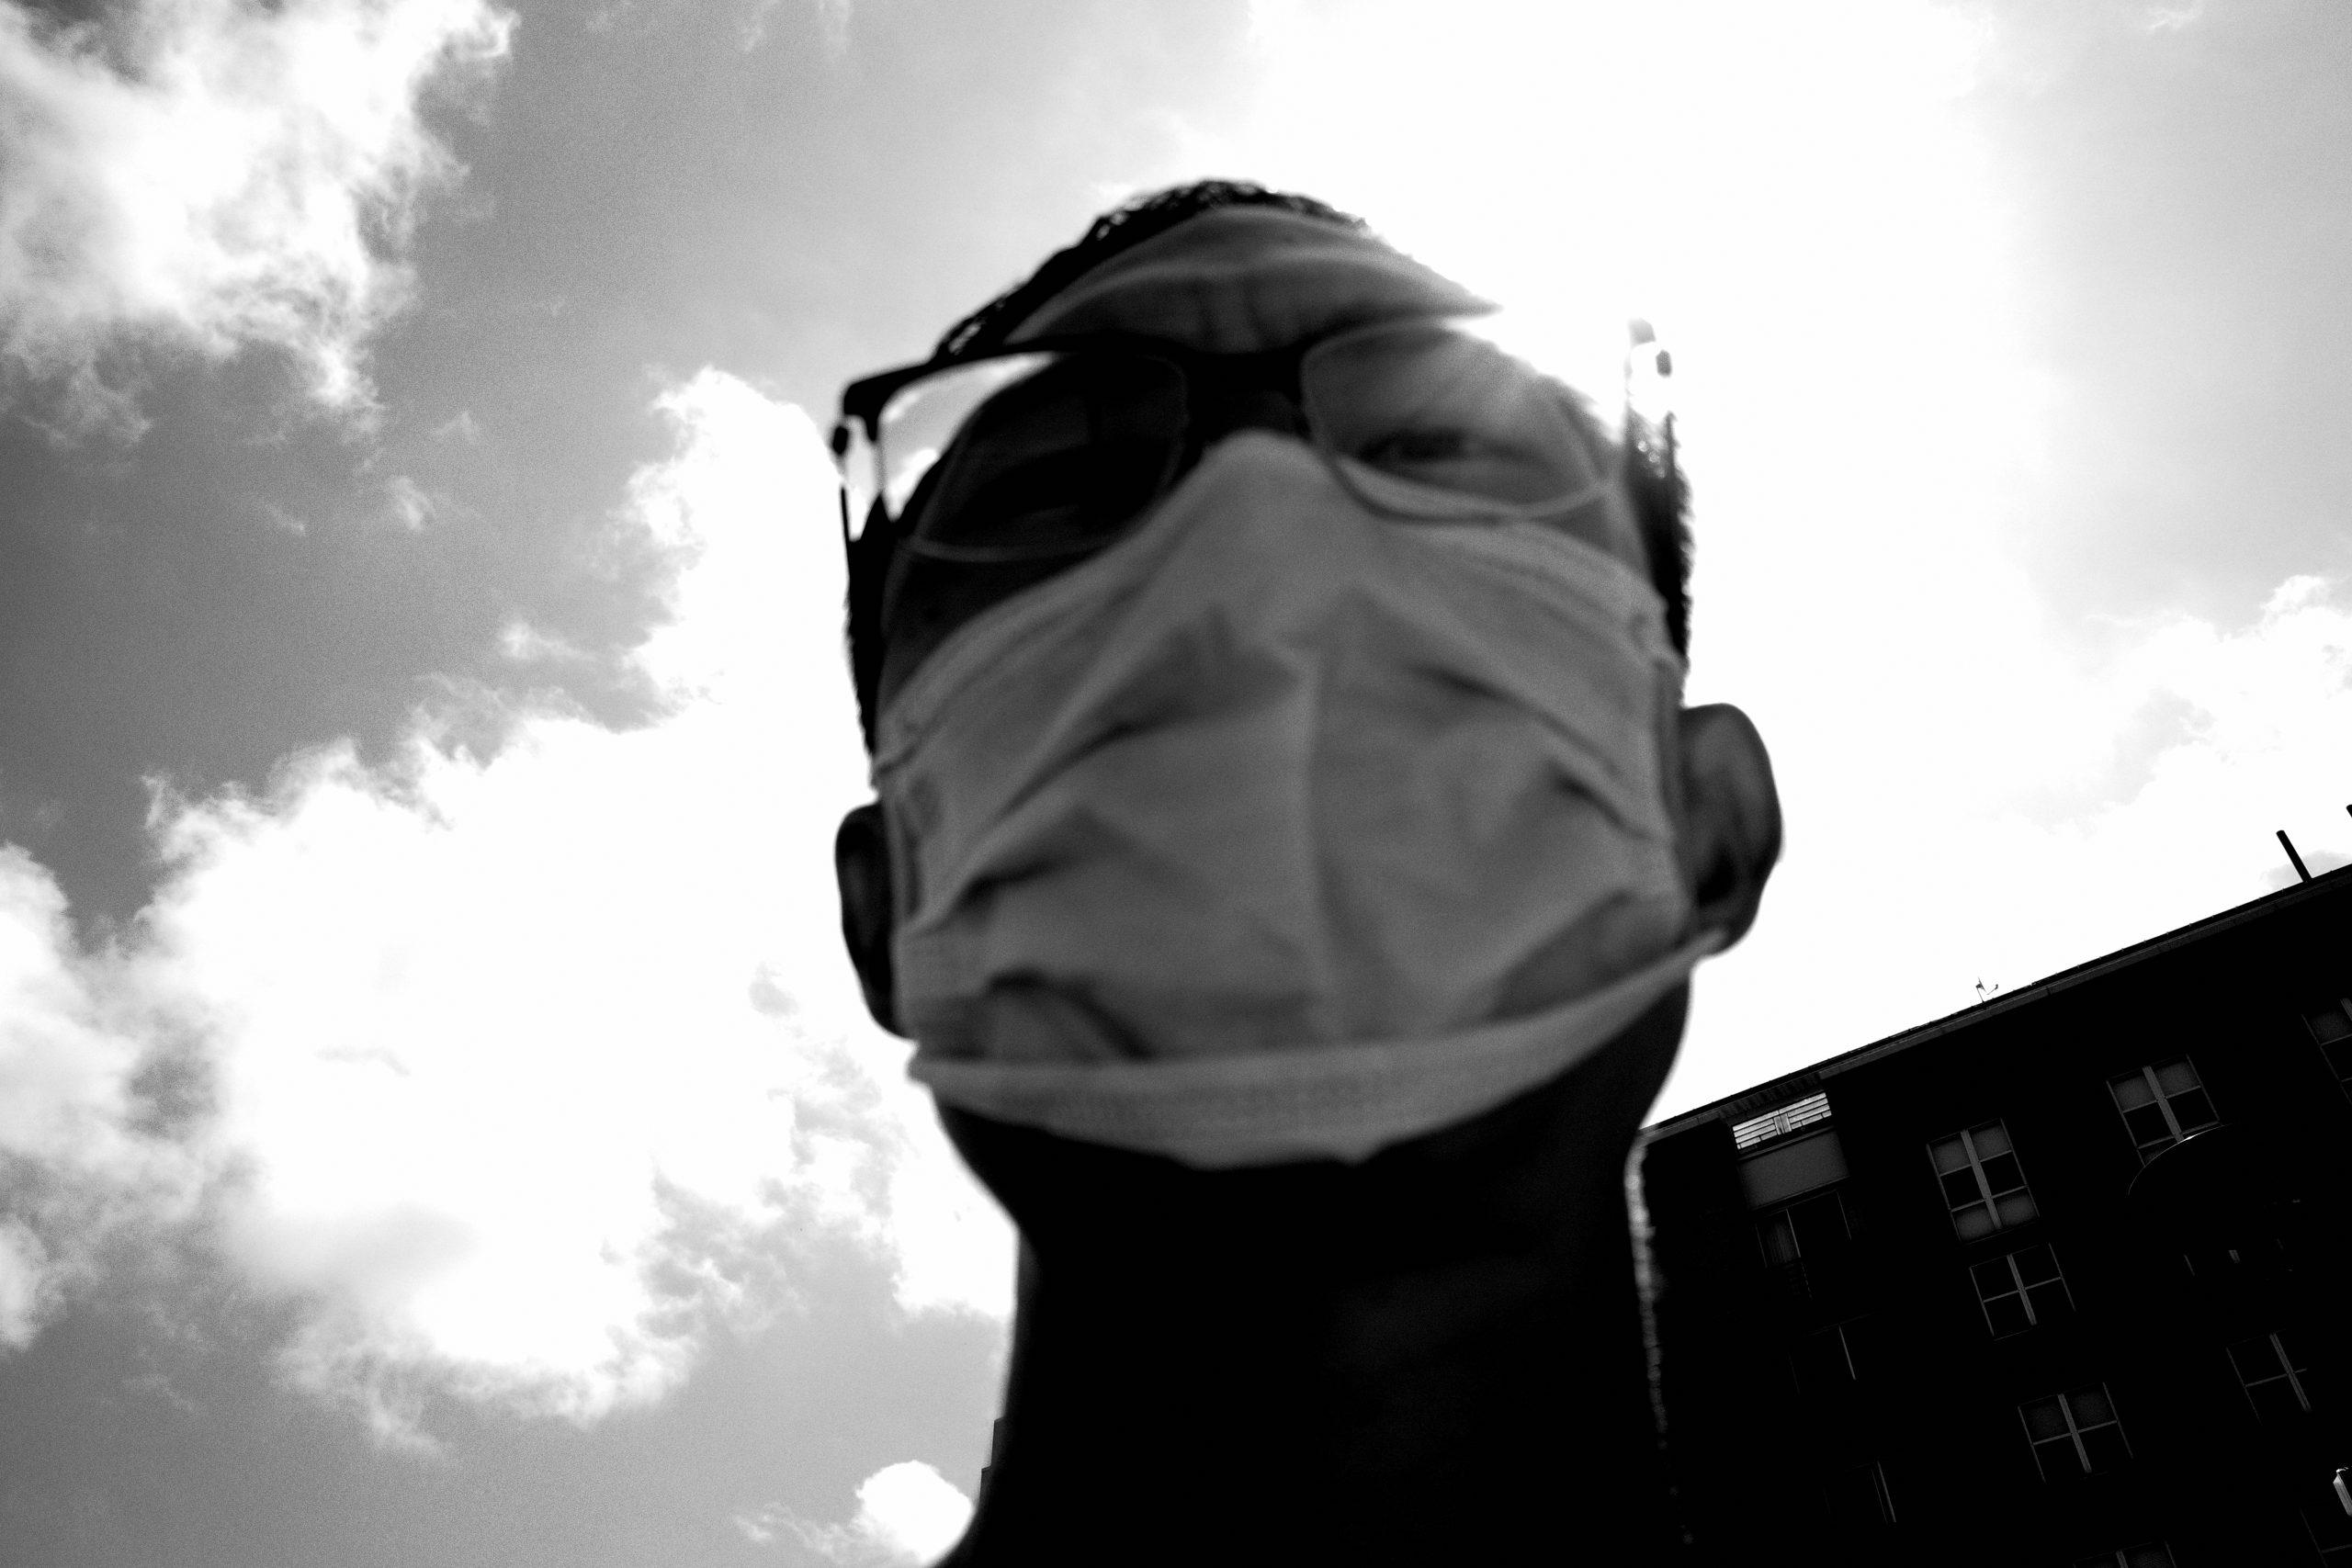 Selfie mask ERIC KIM black and white